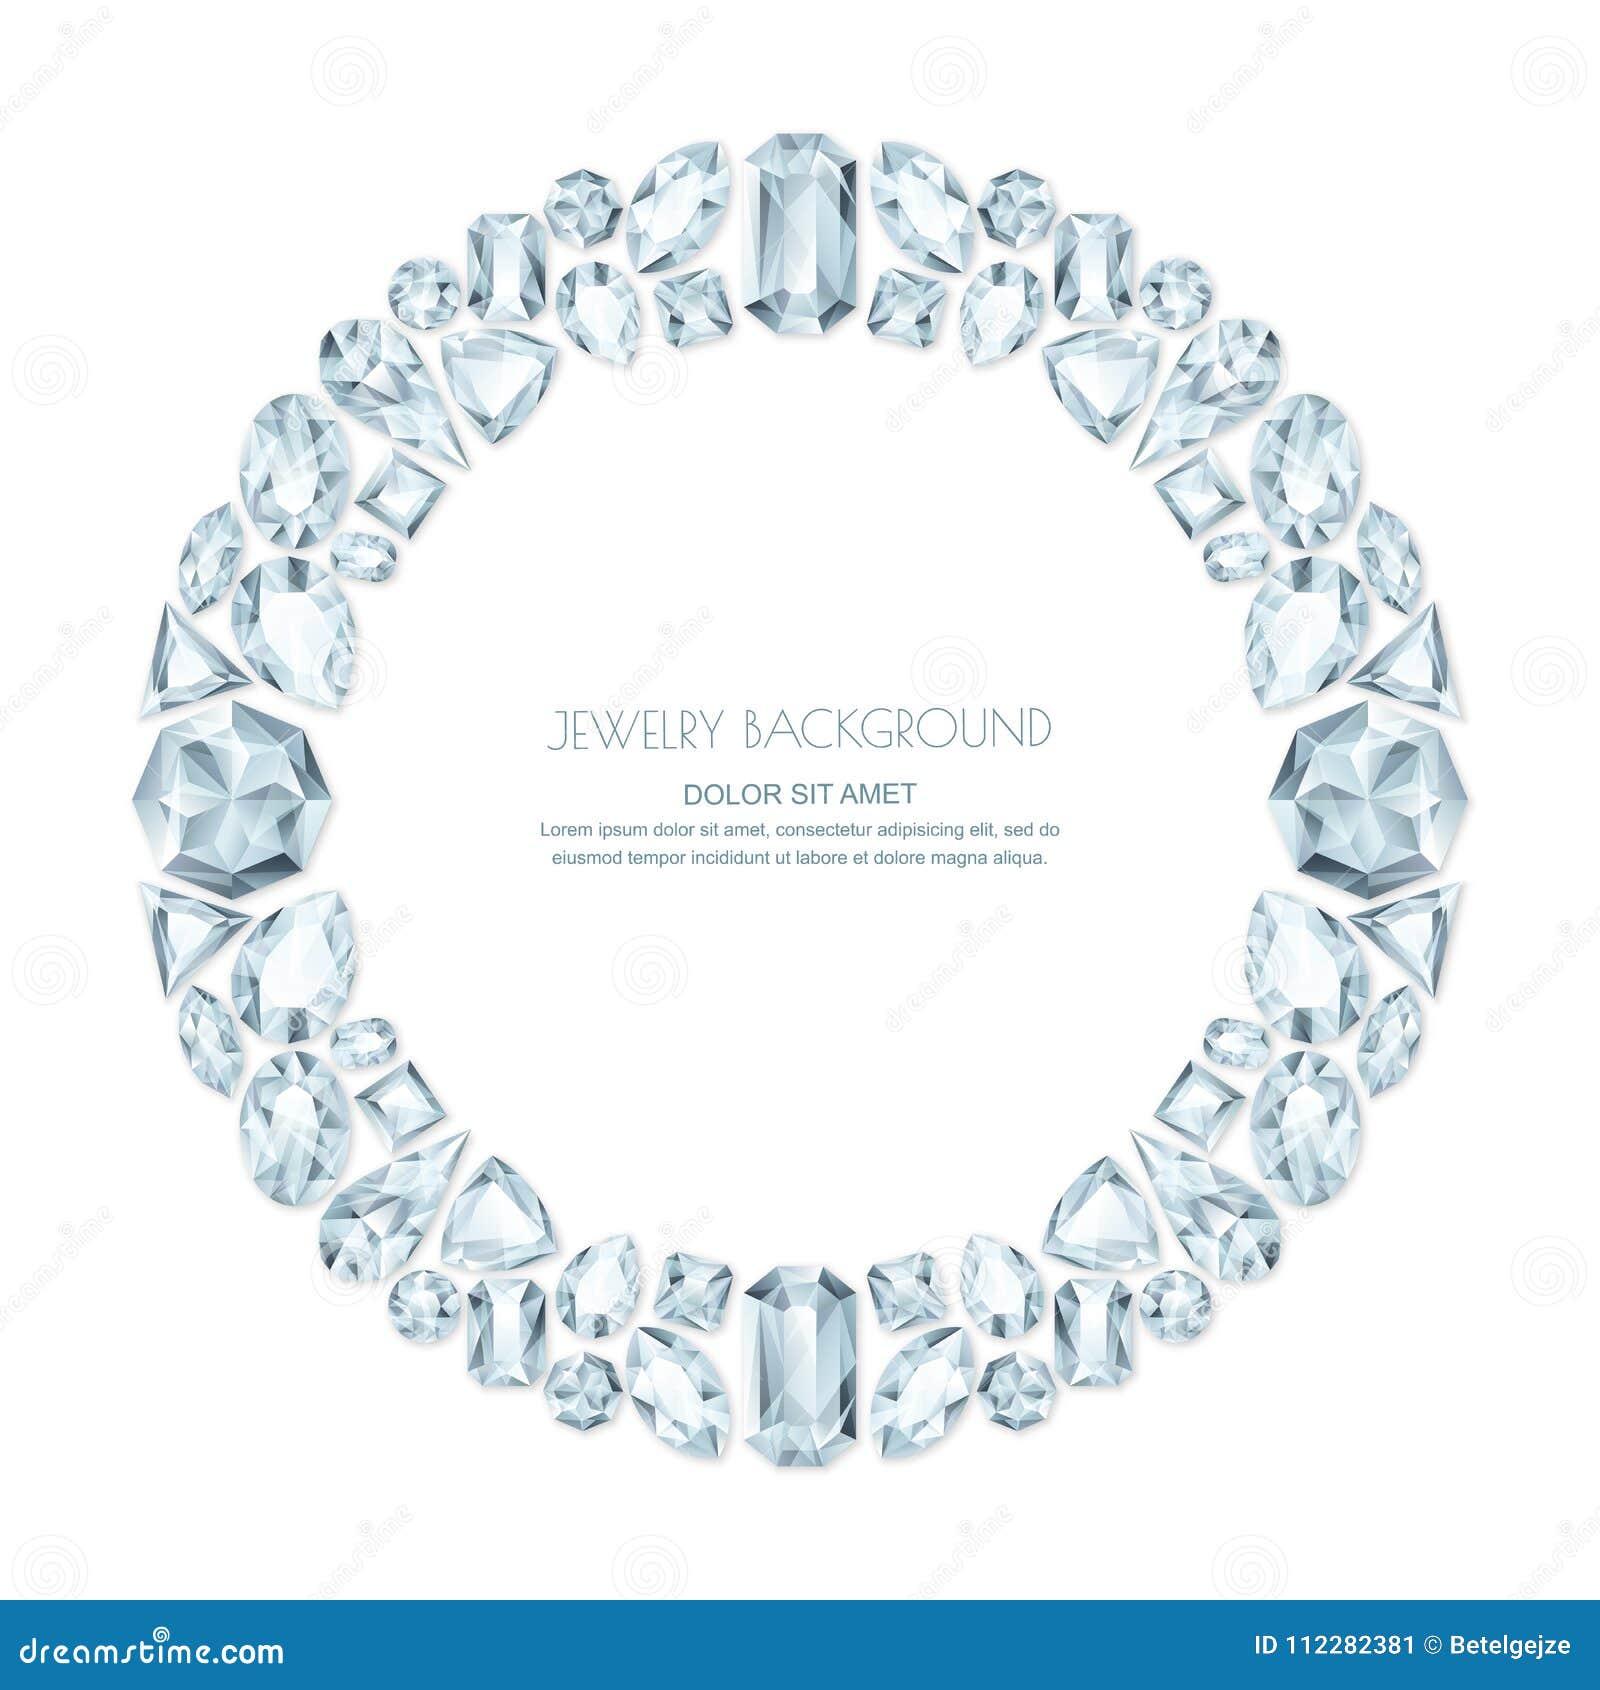 26f3668b26 Διανυσματικό στρογγυλό πλαίσιο από τους ρεαλιστικούς ασημένιους πολύτιμους  λίθους και τα κοσμήματα στο άσπρο υπόβαθρο Λαμπρά στοιχεία σχεδίου  κοσμήματος ...